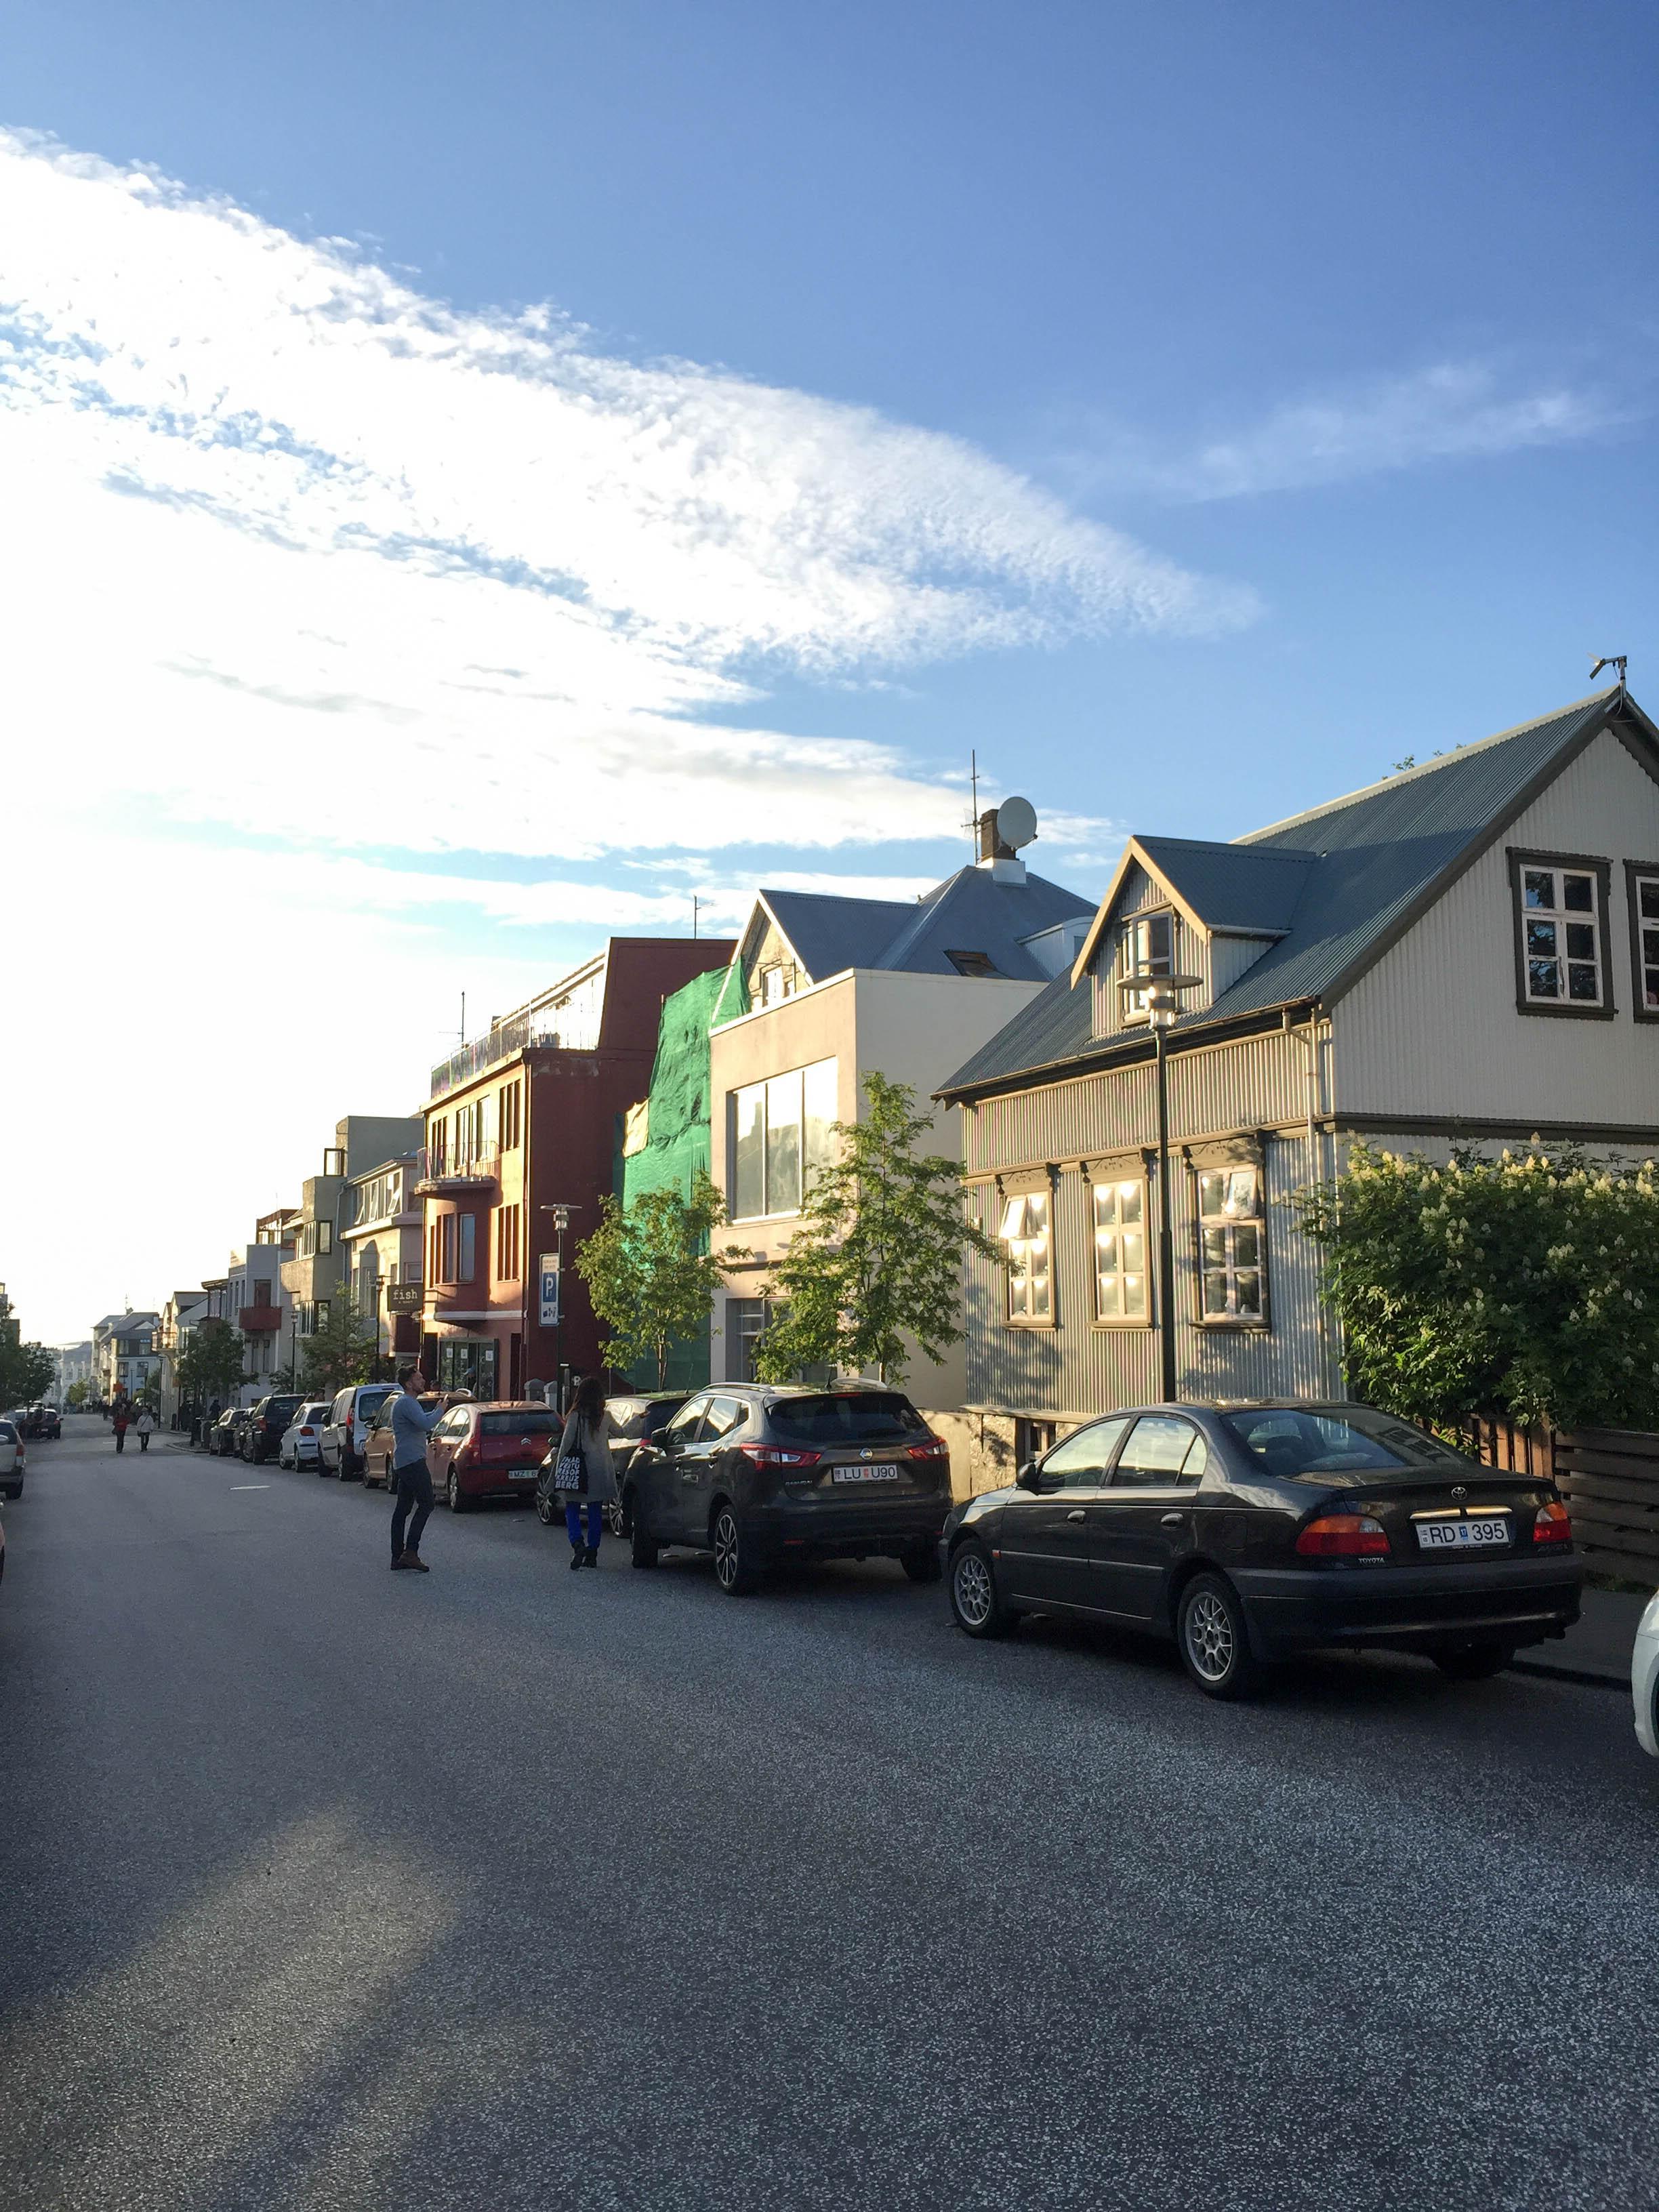 Straßenzug in Reykjavik